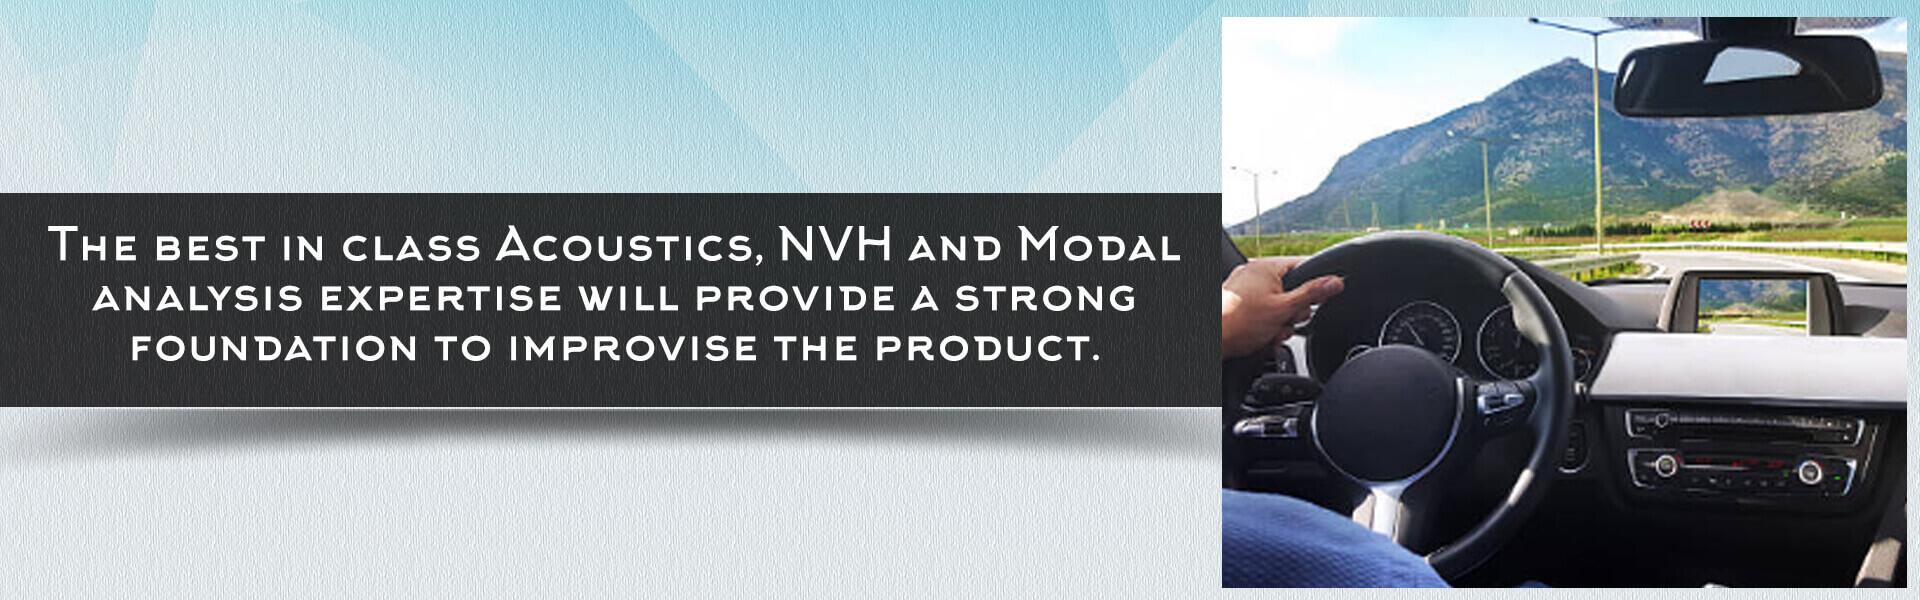 Envitest Laboratories - Accoustics & NVH Modal Analysis